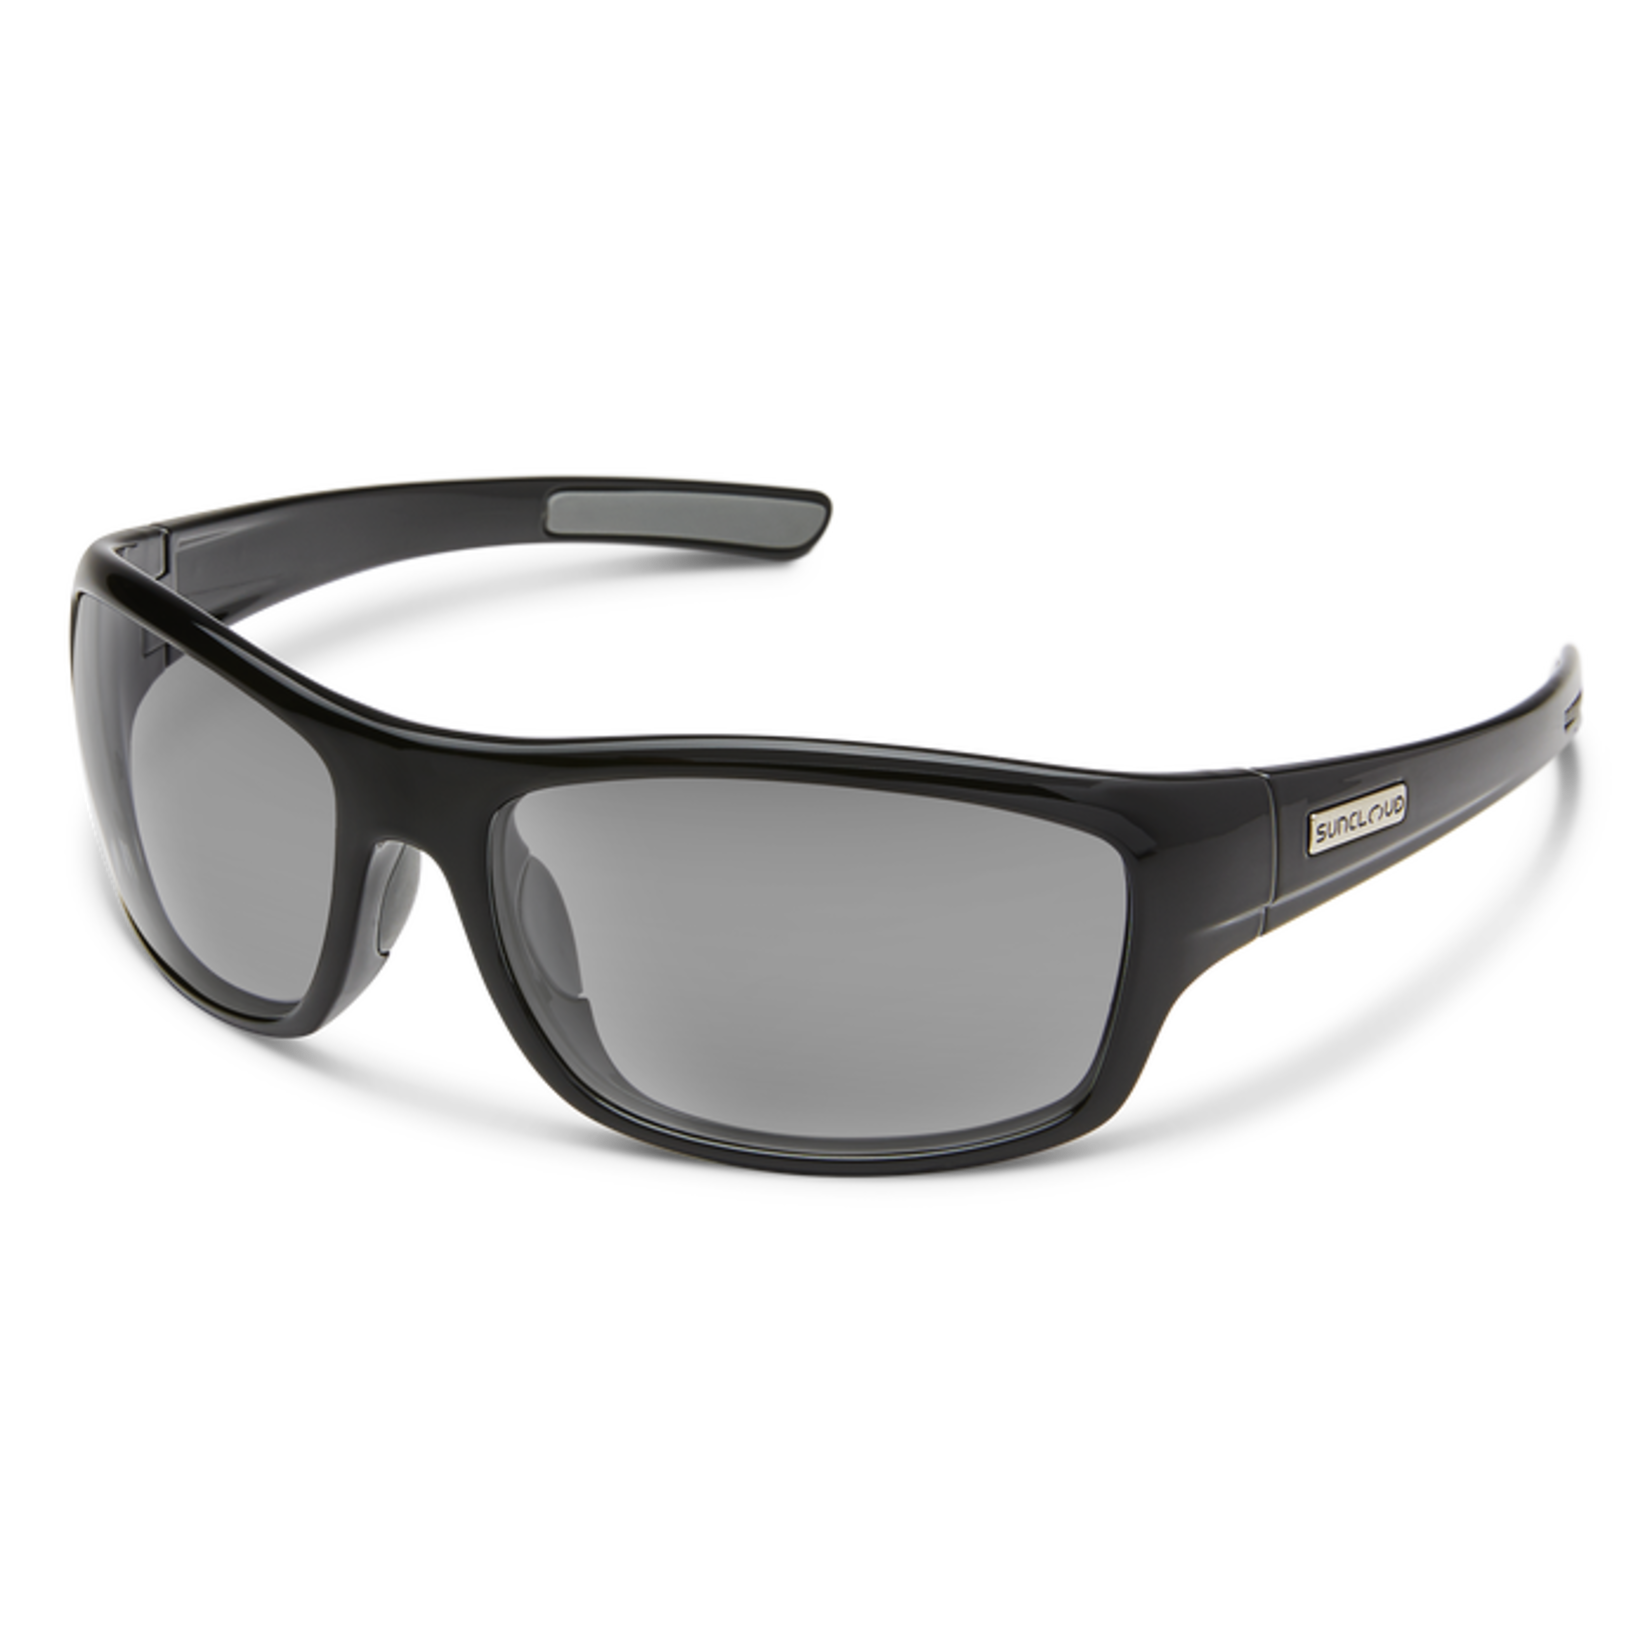 Suncloud Optics Suncloud Cover Polarized Sunglasses